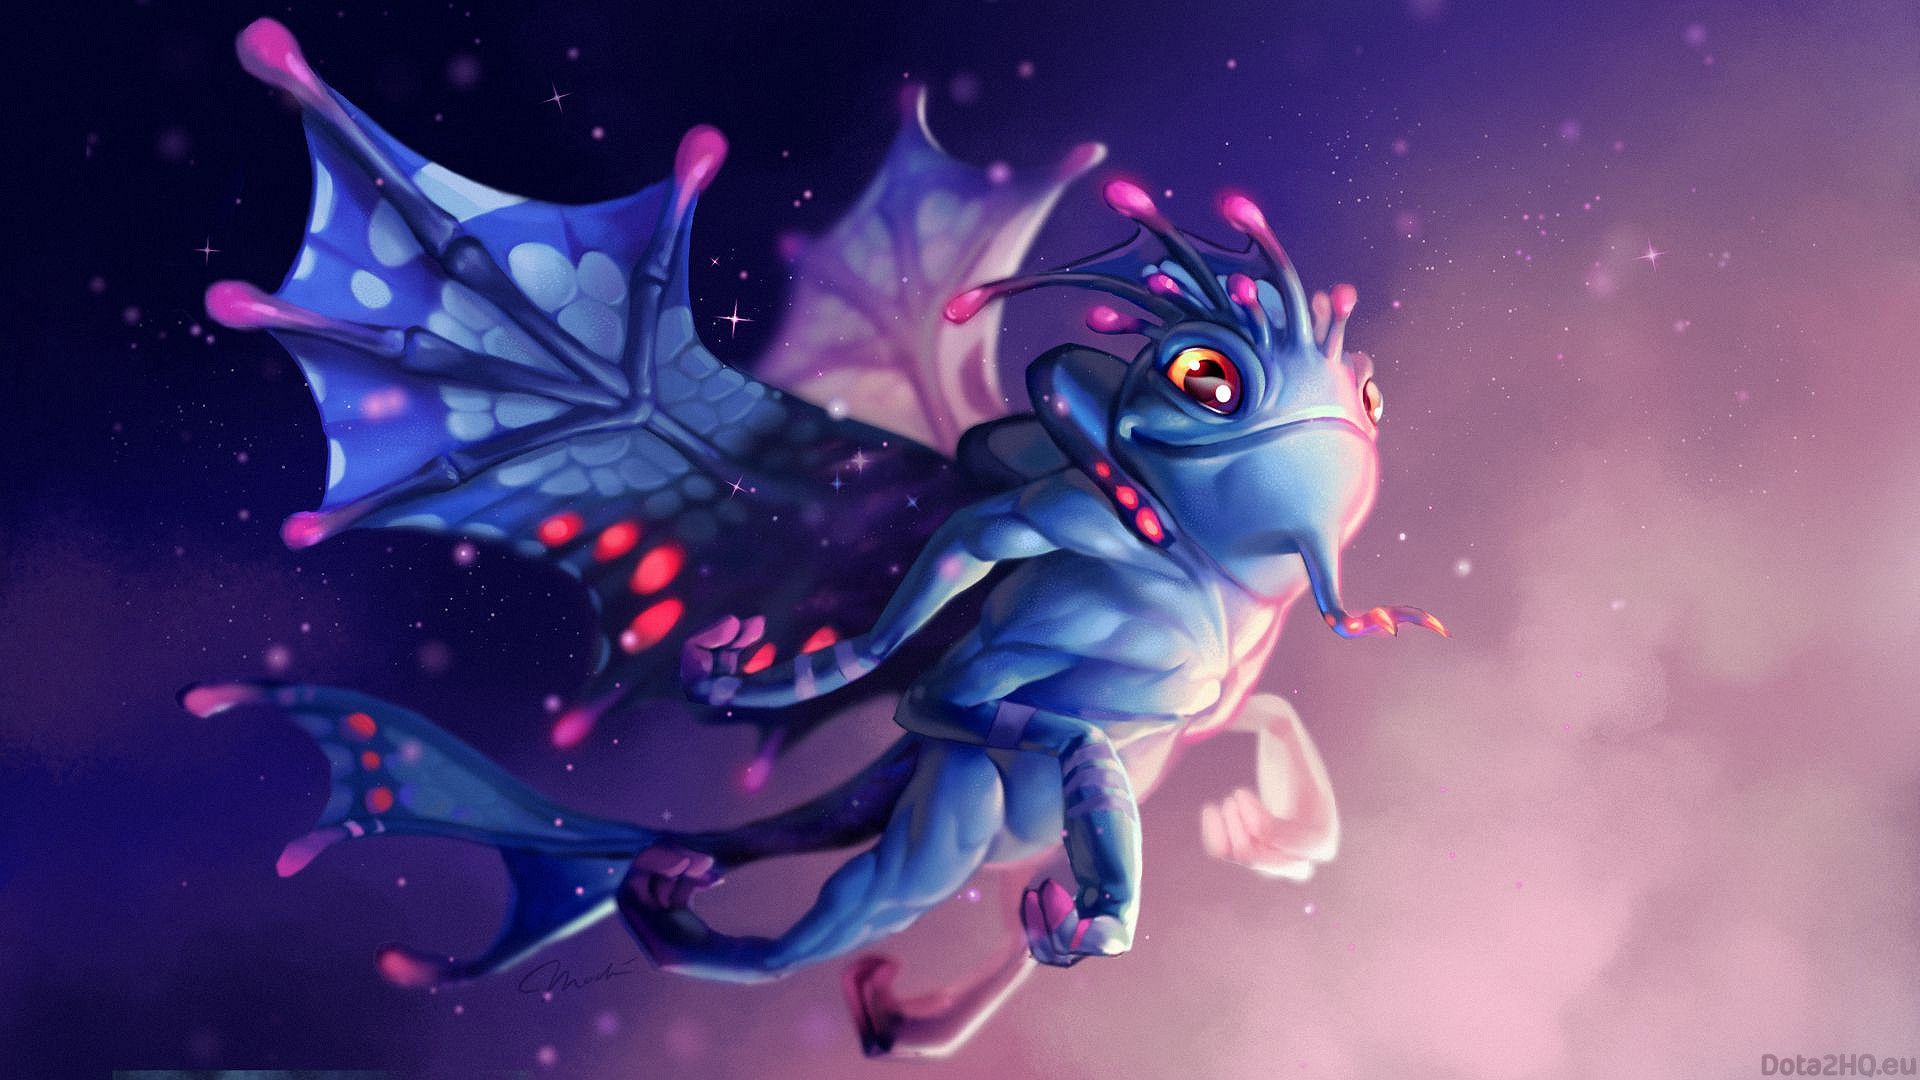 Puck, the Faerie Dragon (Eternal Nymph)